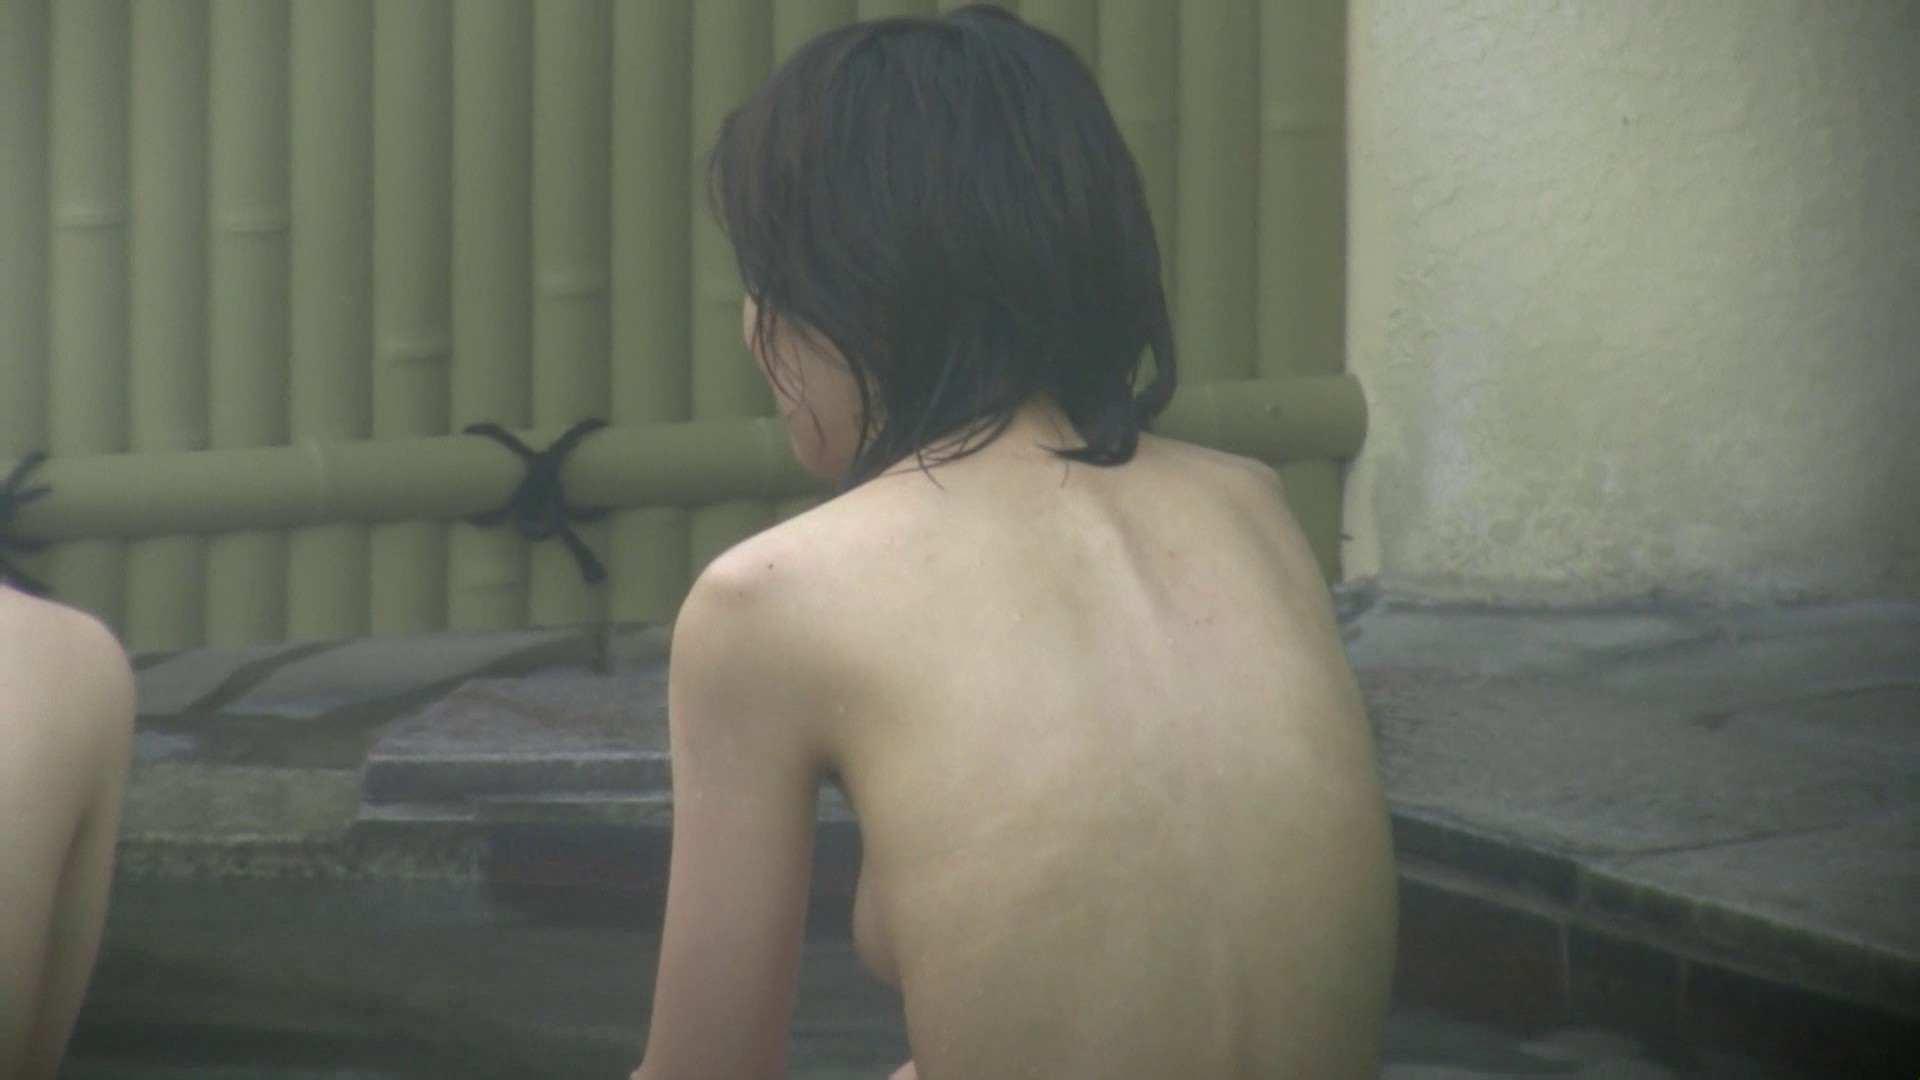 Aquaな露天風呂Vol.583 HなOL | 露天  81pic 76